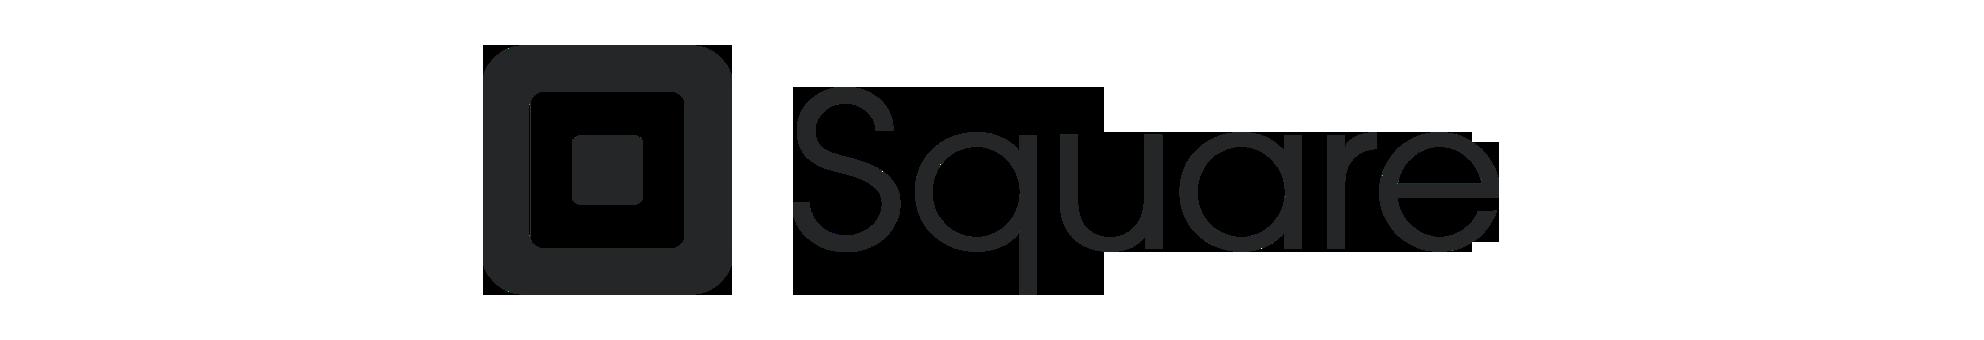 Square Inc Logo Svg